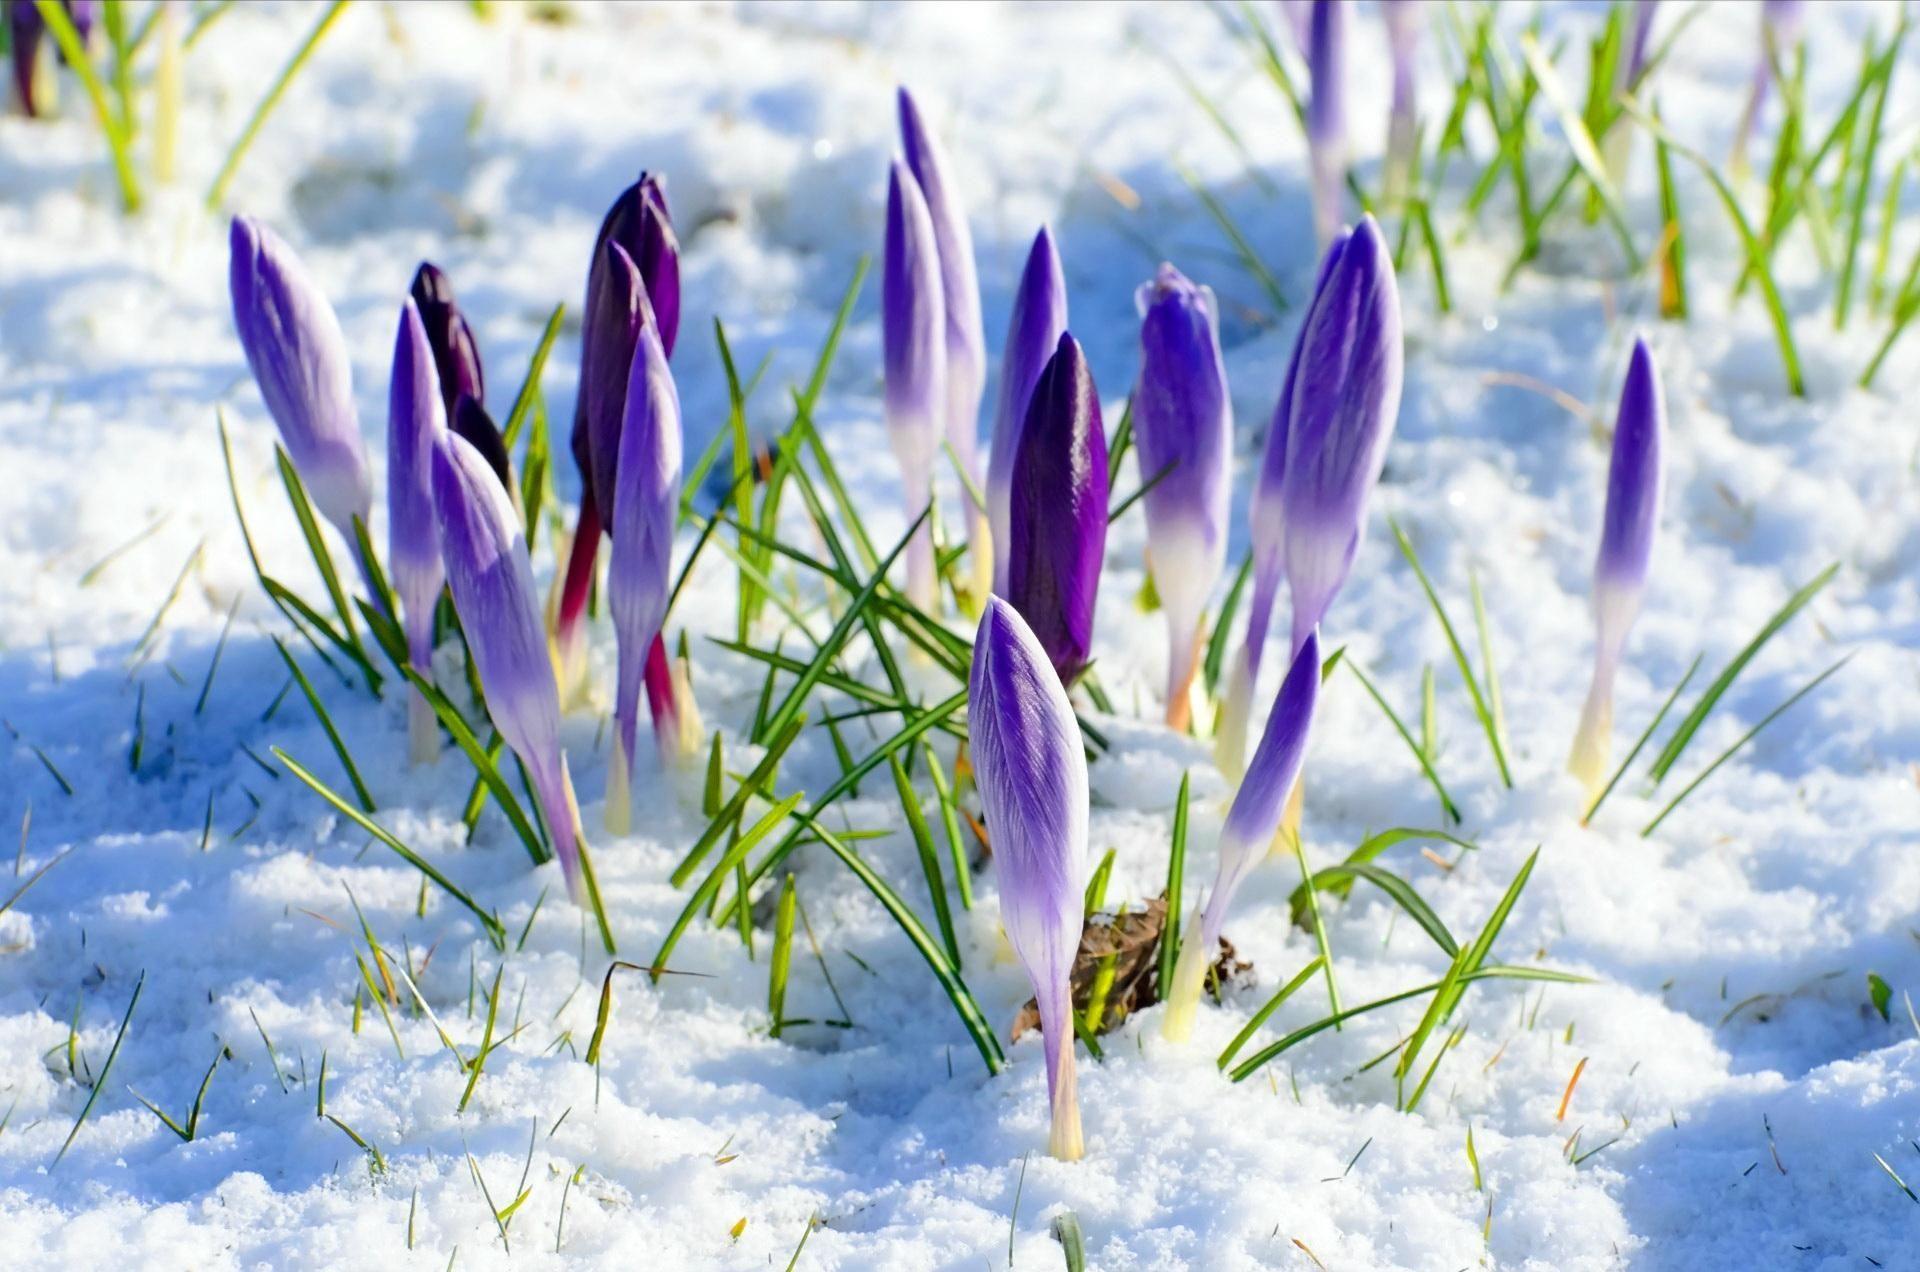 1920x1272 Spring Flower Snow Hd Desktop Wallpaper Widescreen High Spring Pictures Crocus Flower Spring Flowers